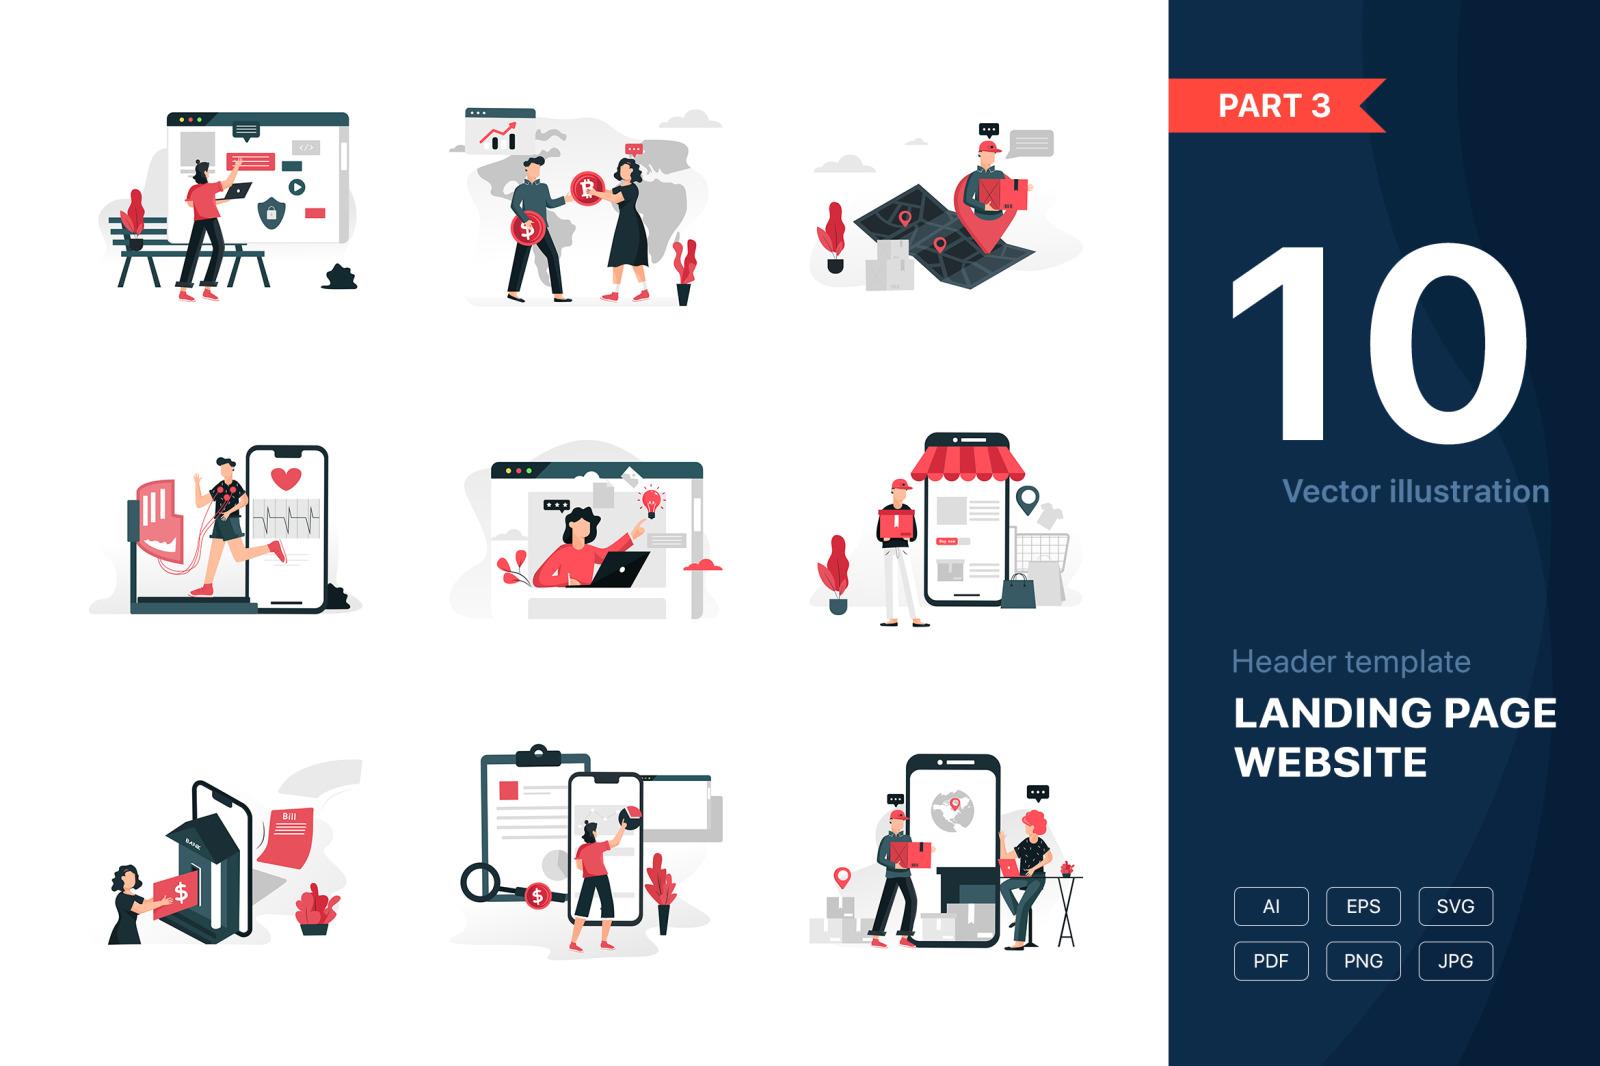 [Part 3] Website Illustrations Set